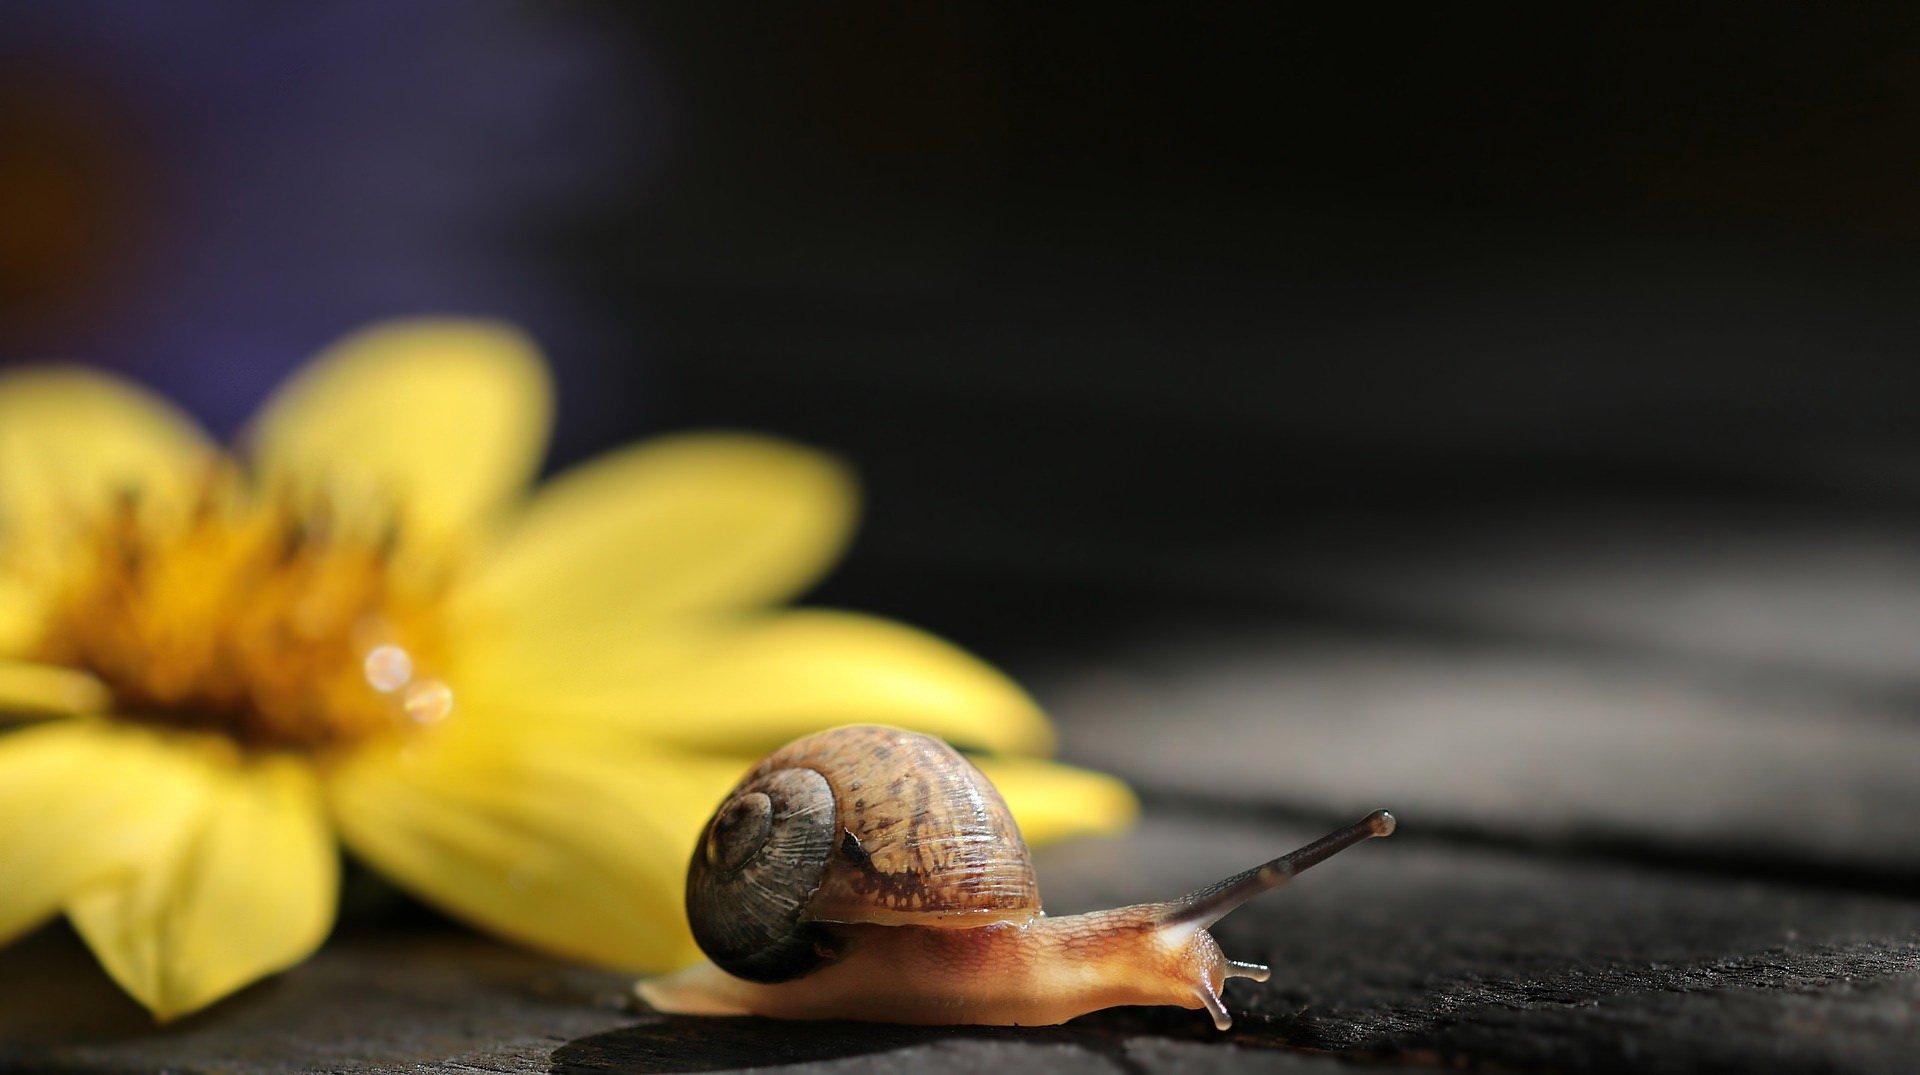 Piosenka o ślimaku, tekst i melodia